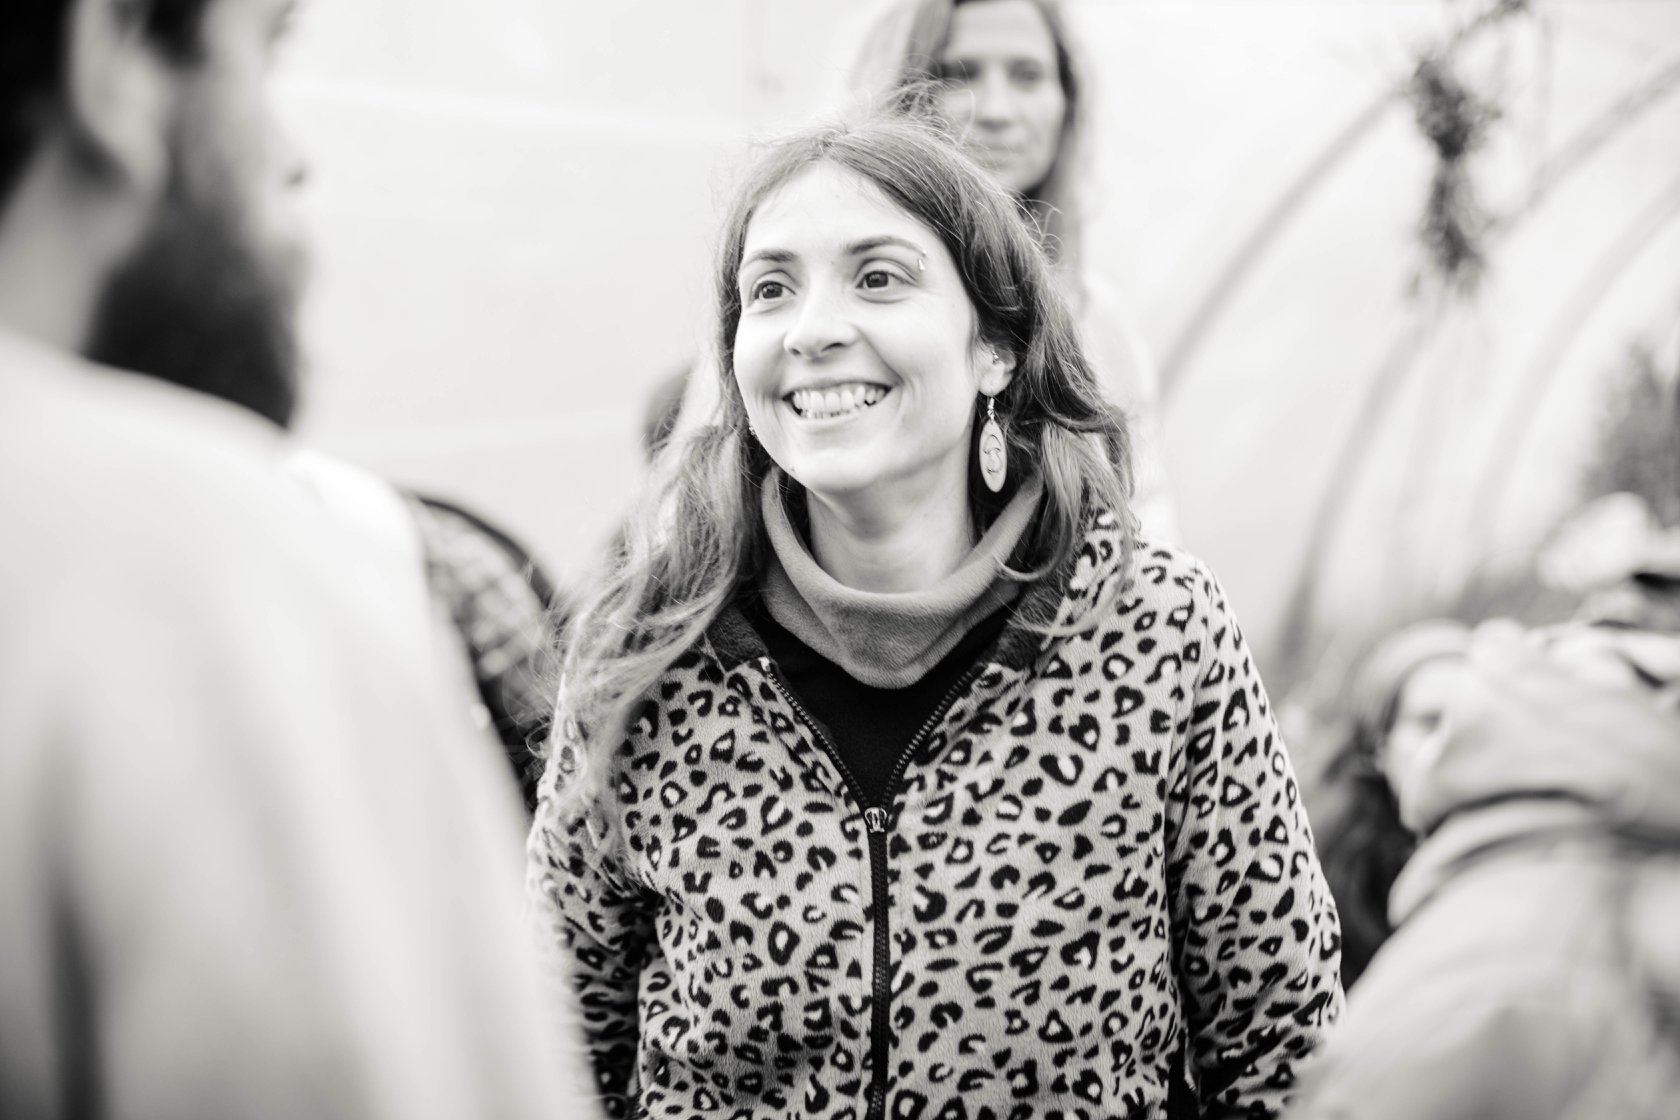 Susana Guimaraes - Gründerin des Vereins Reflorestar Portugal